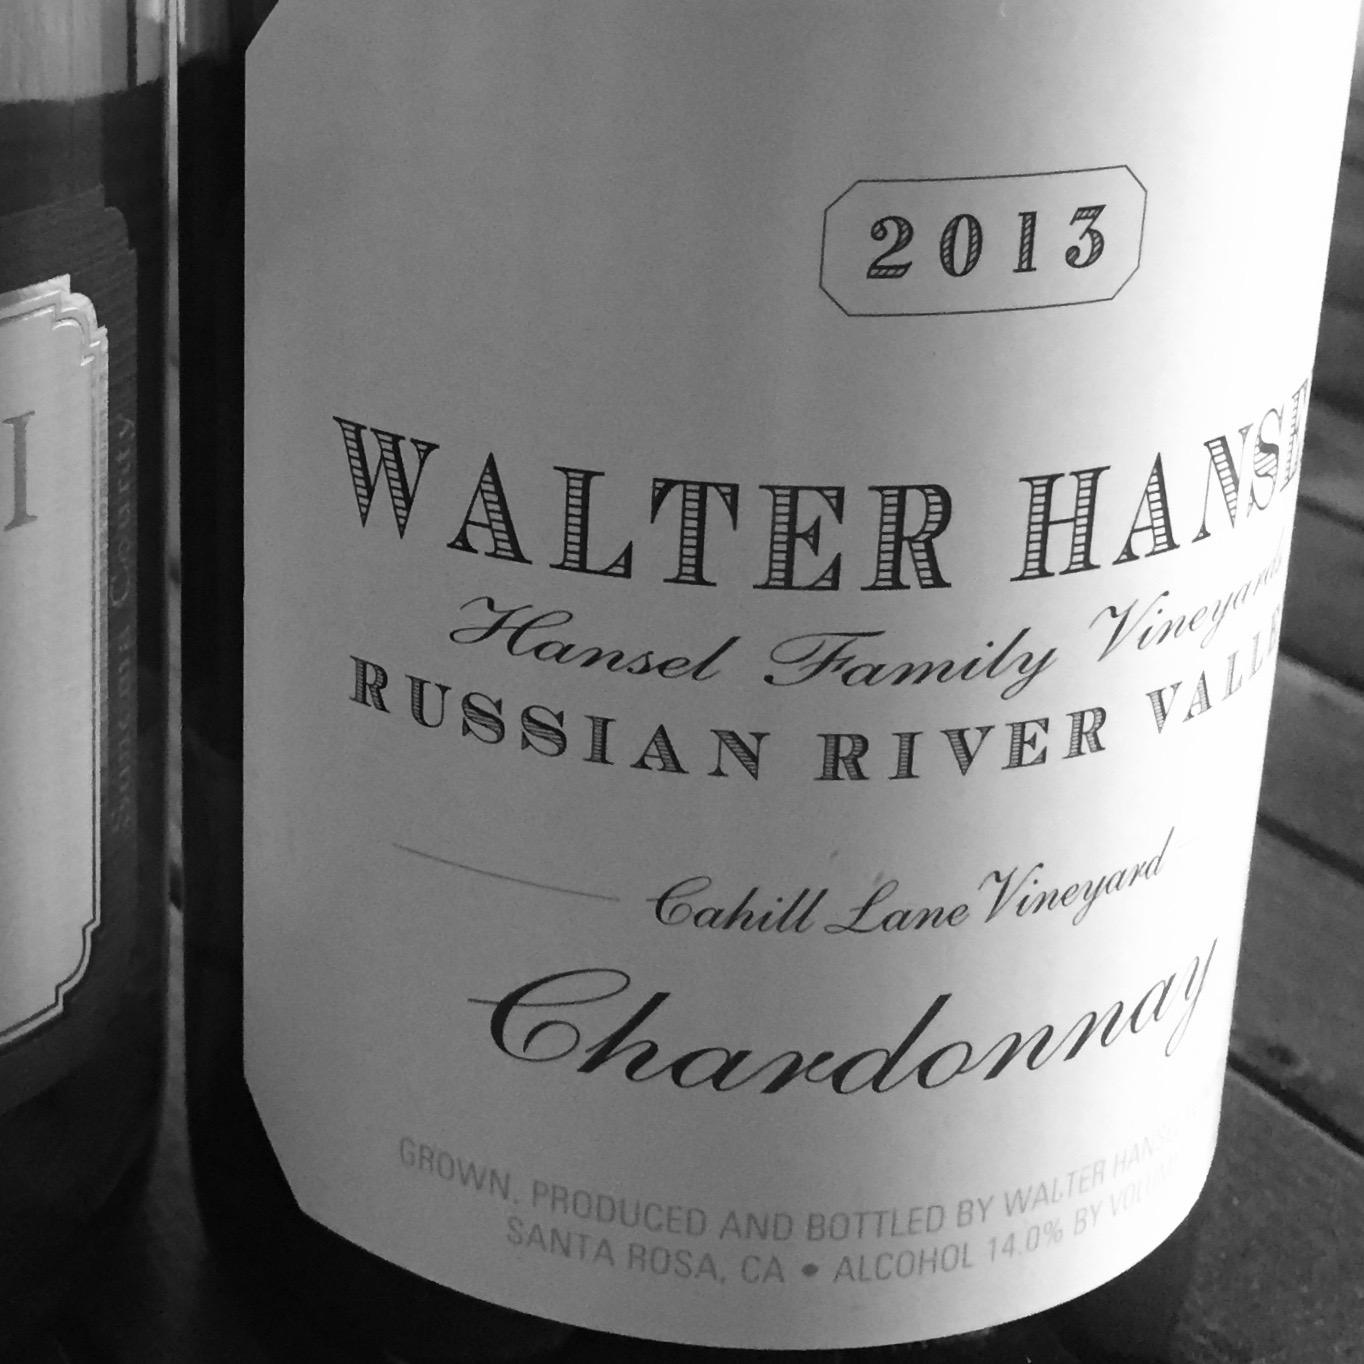 Walter Hansel Winery